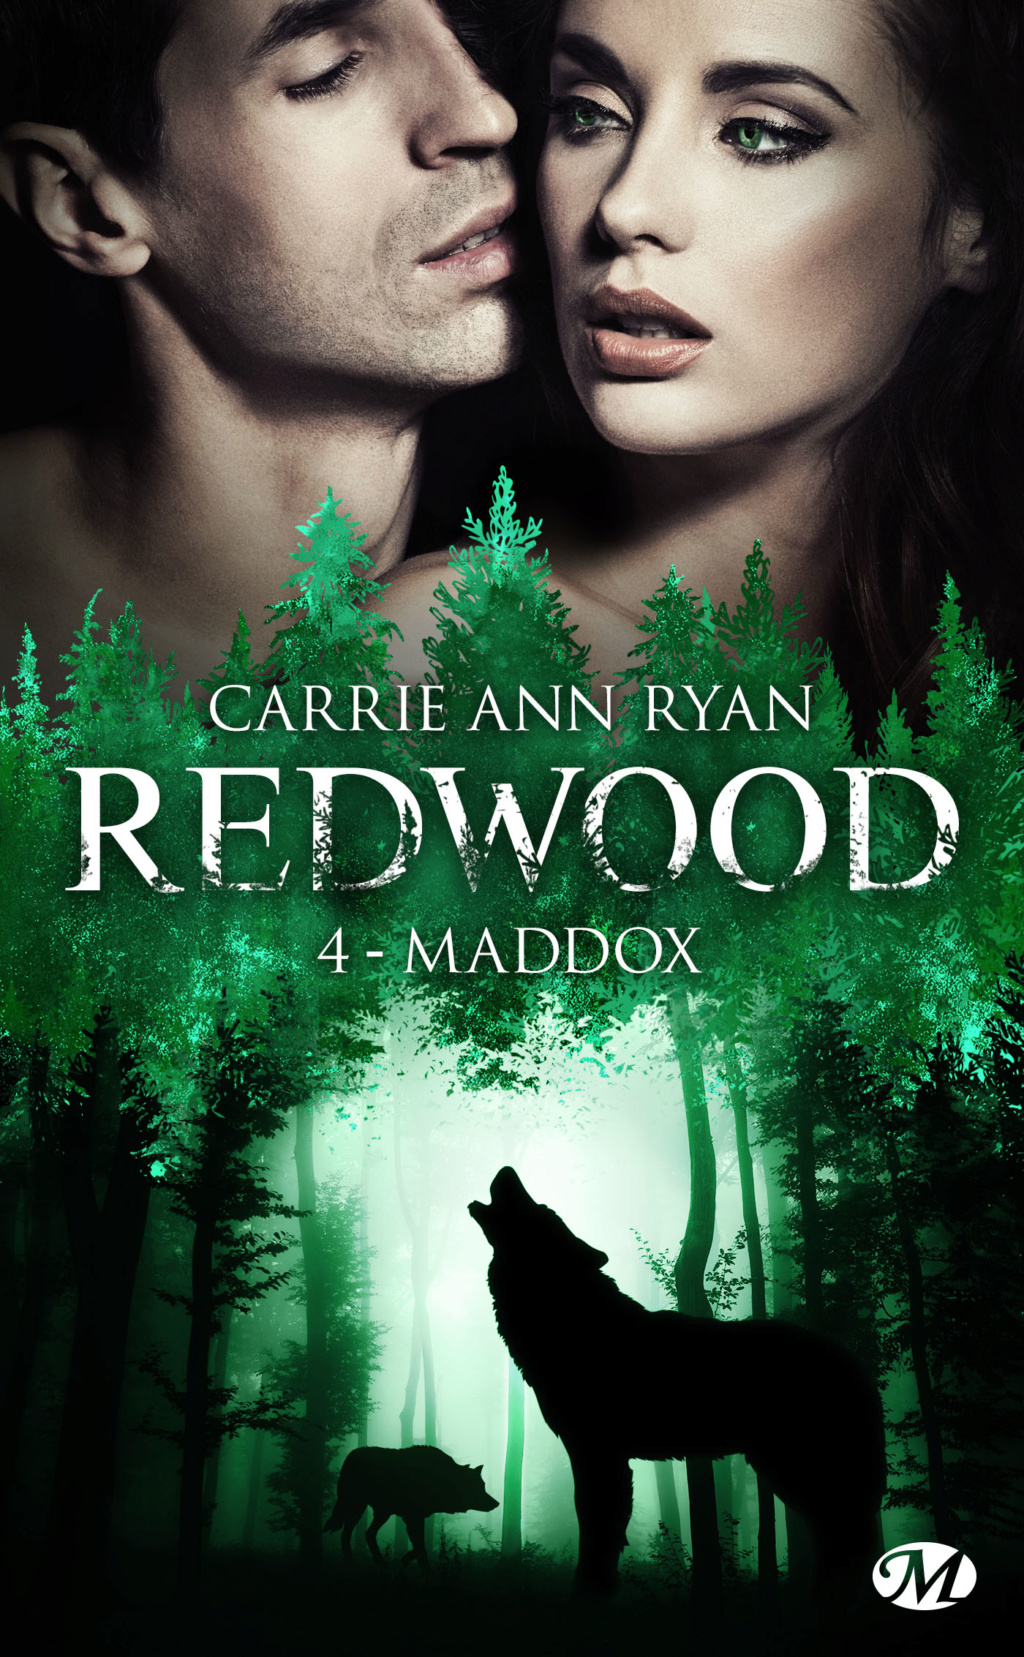 Redwood - Tome 4 : Maddox de Carrie Ann Ryan Redwoo10